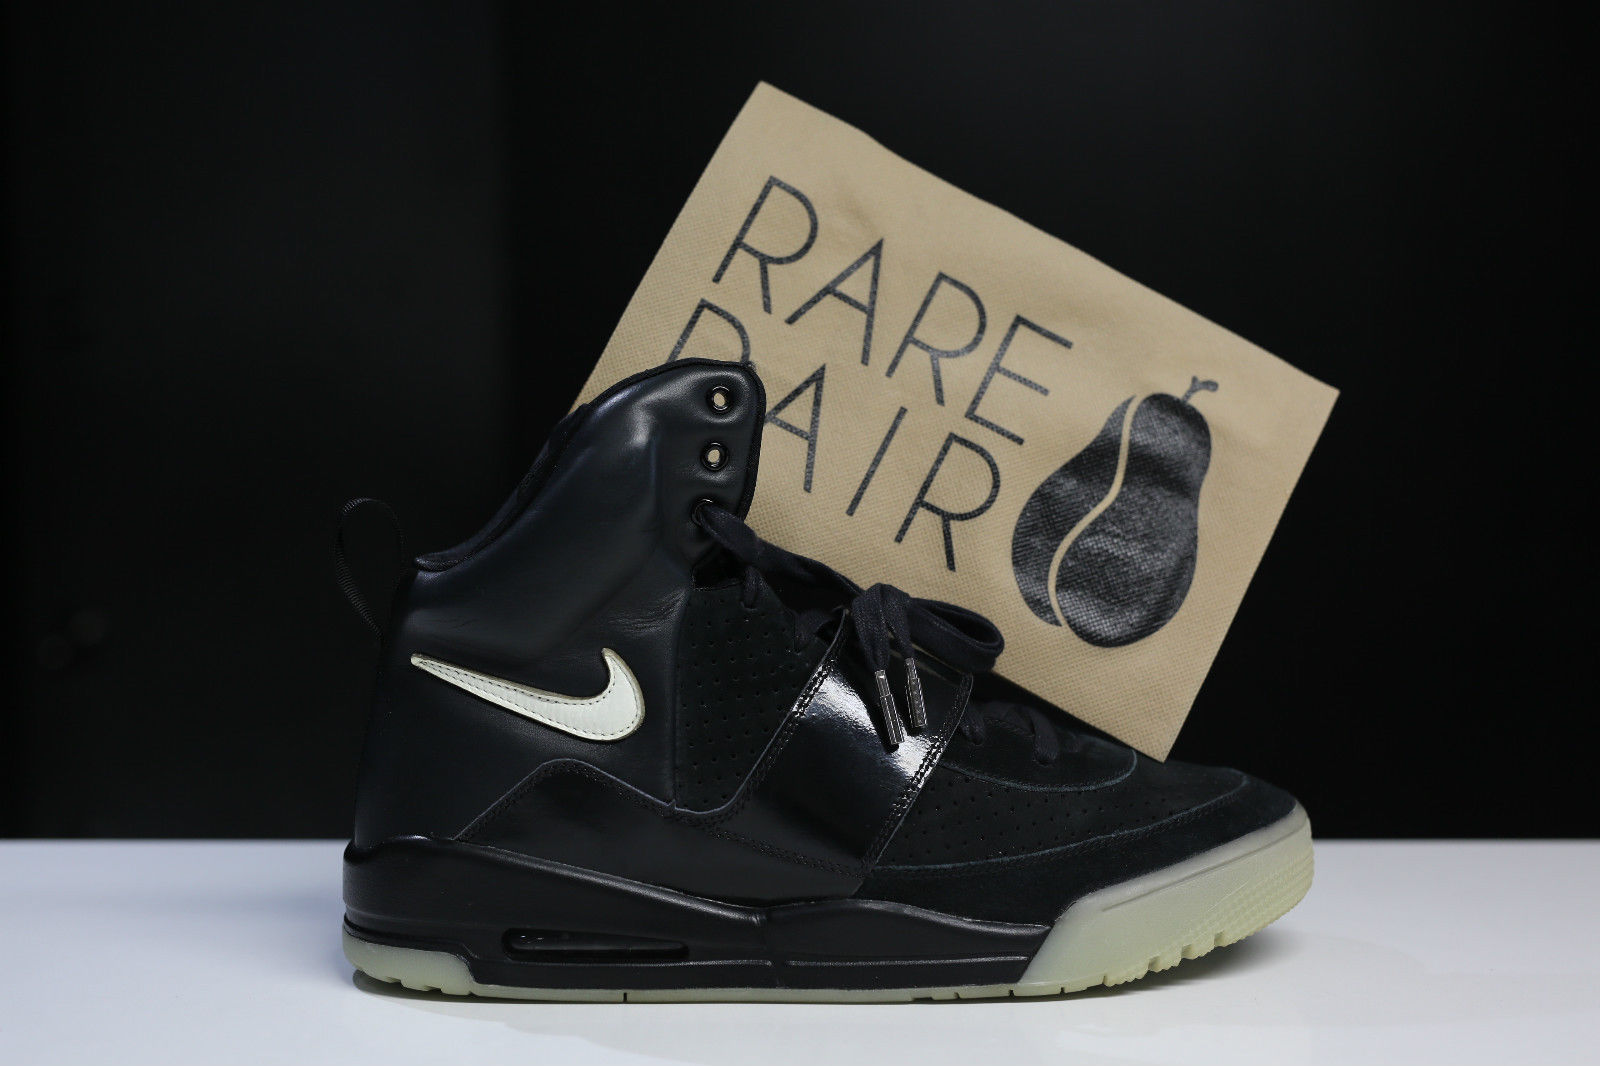 Nike Air Yeezy Kanye West Black/White Sample Pair Side